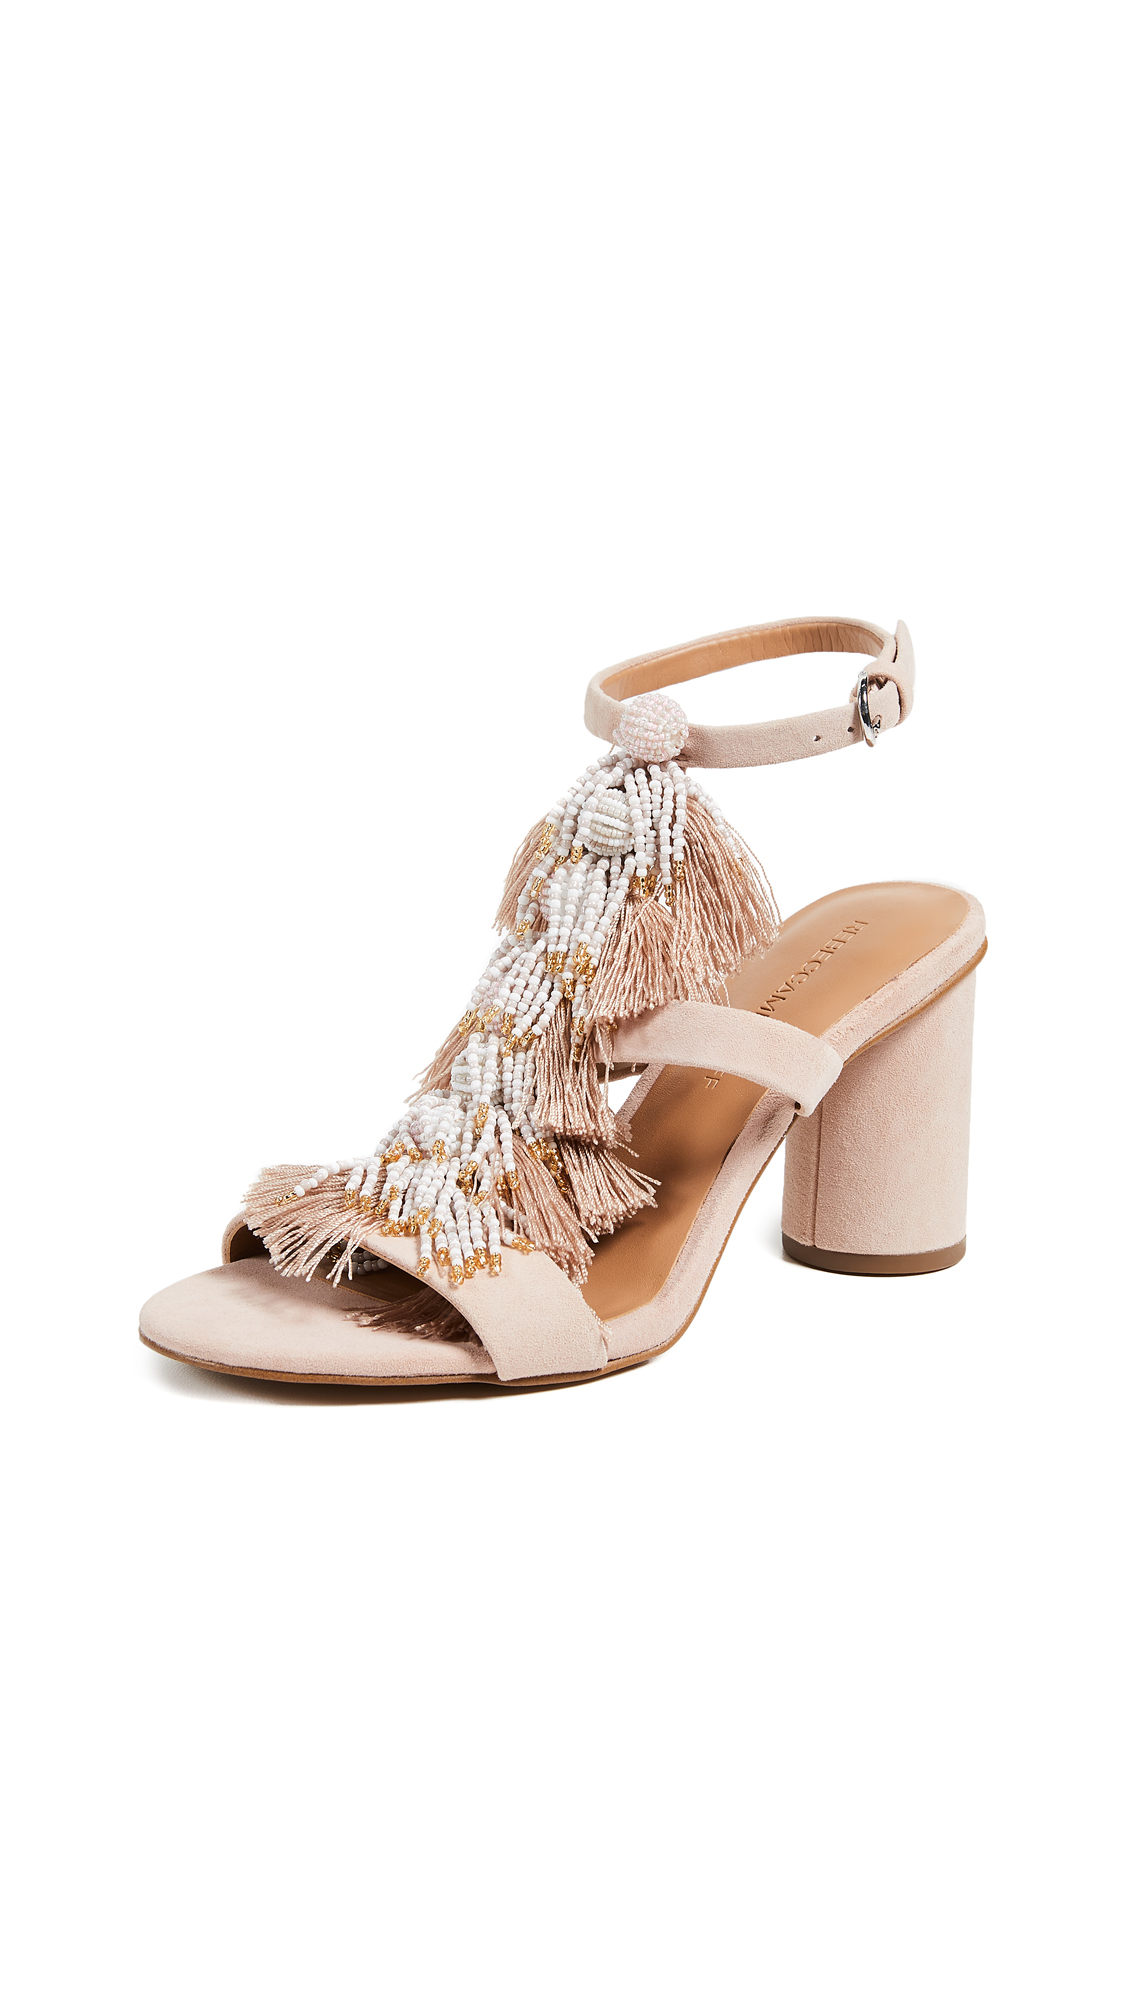 Rebecca Minkoff Alnie Block Heel Sandals - Ceramic